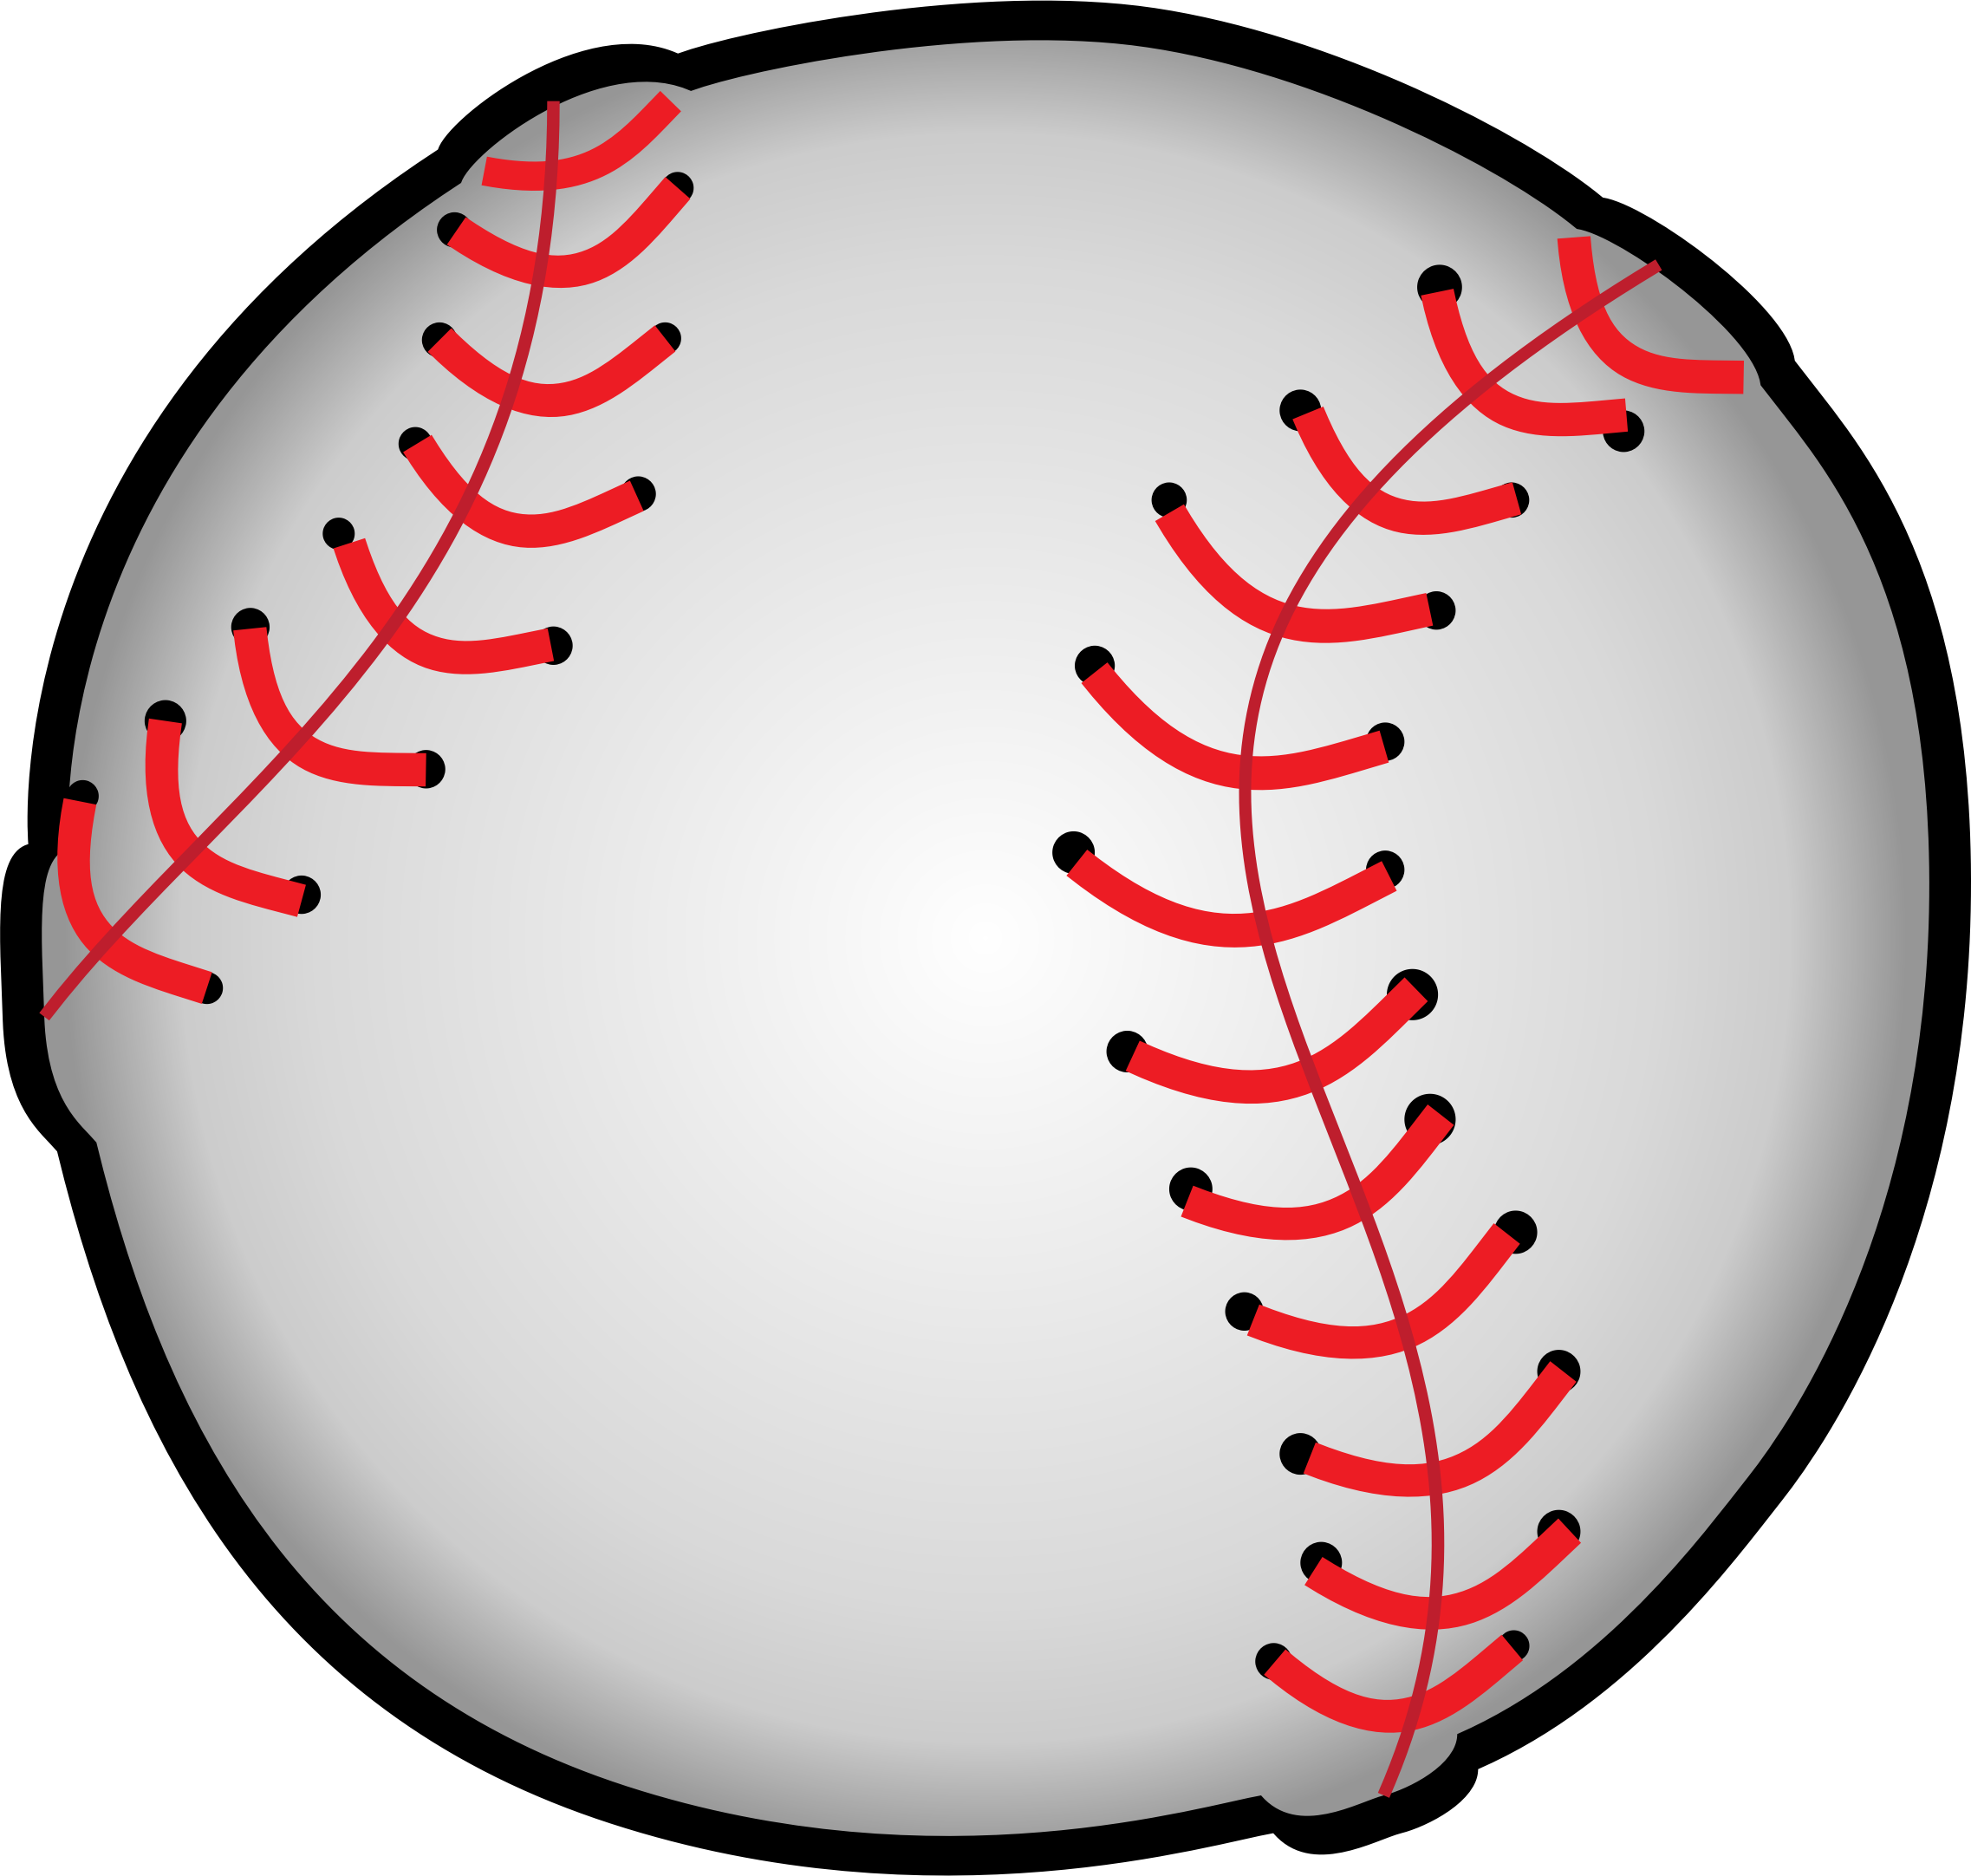 Clipart - Baseball